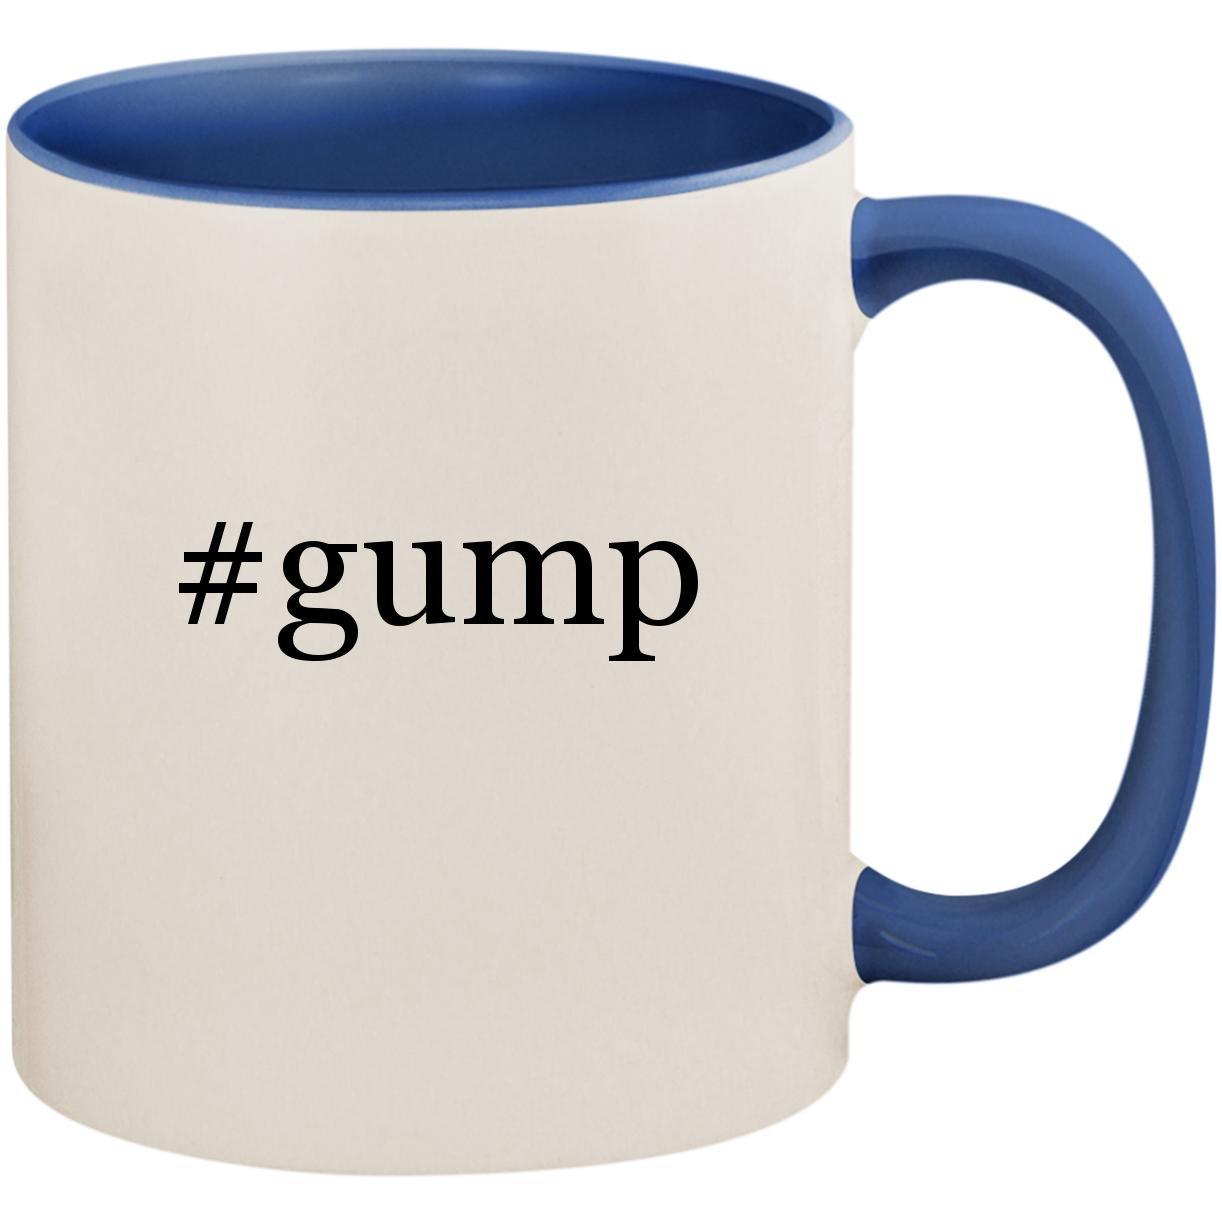 # Gump – 11オンスセラミックColored内側とハンドルコーヒーMug Cup B07FLYYFCC Cambridge Blue